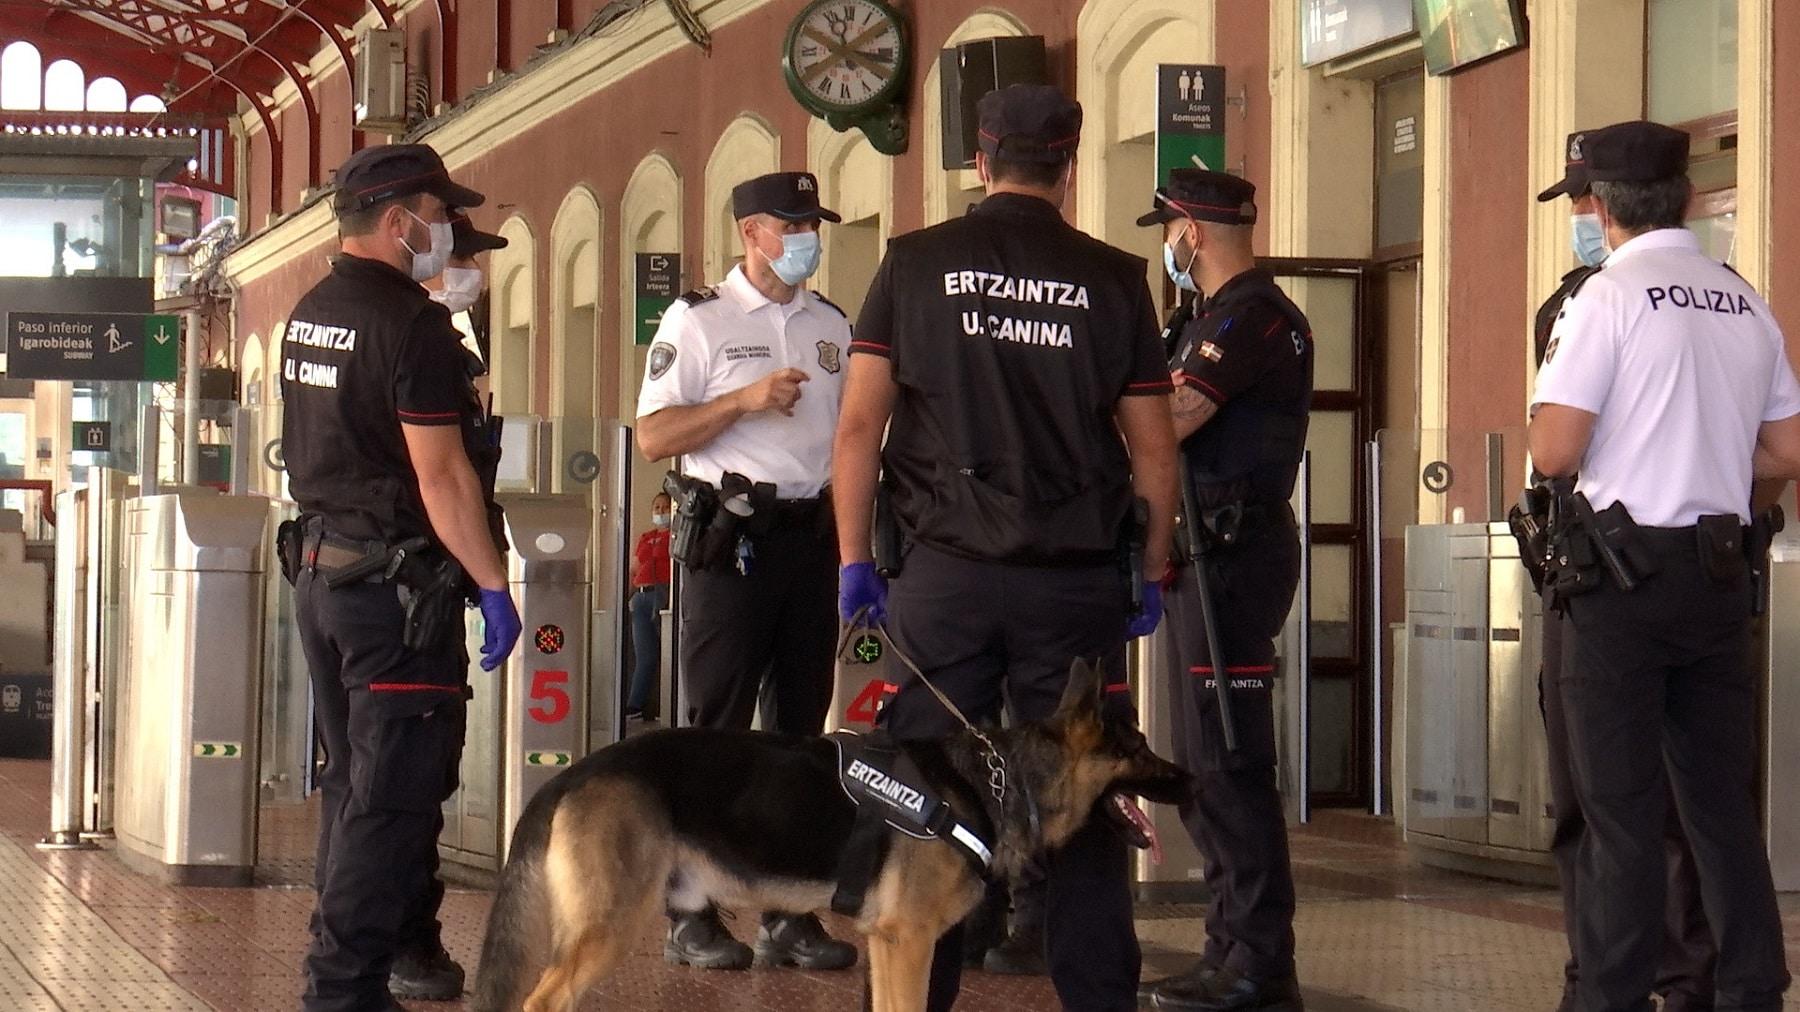 estacionErtzaintza3 - Perros para detectar droga en las estaciones de Donostia